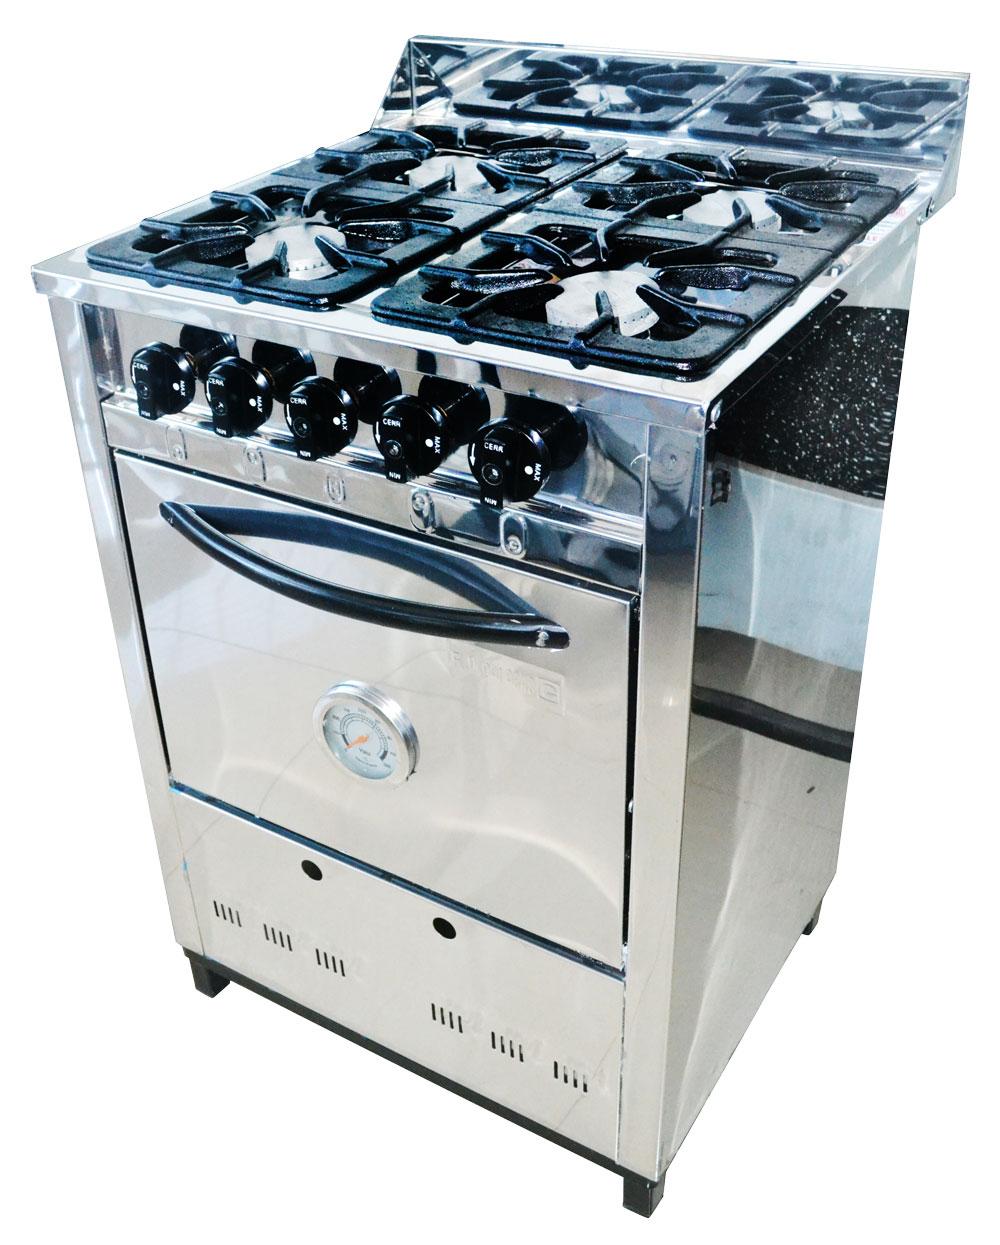 Cocina Semi Industrial Best Cocina Fj Calabro With Cocina